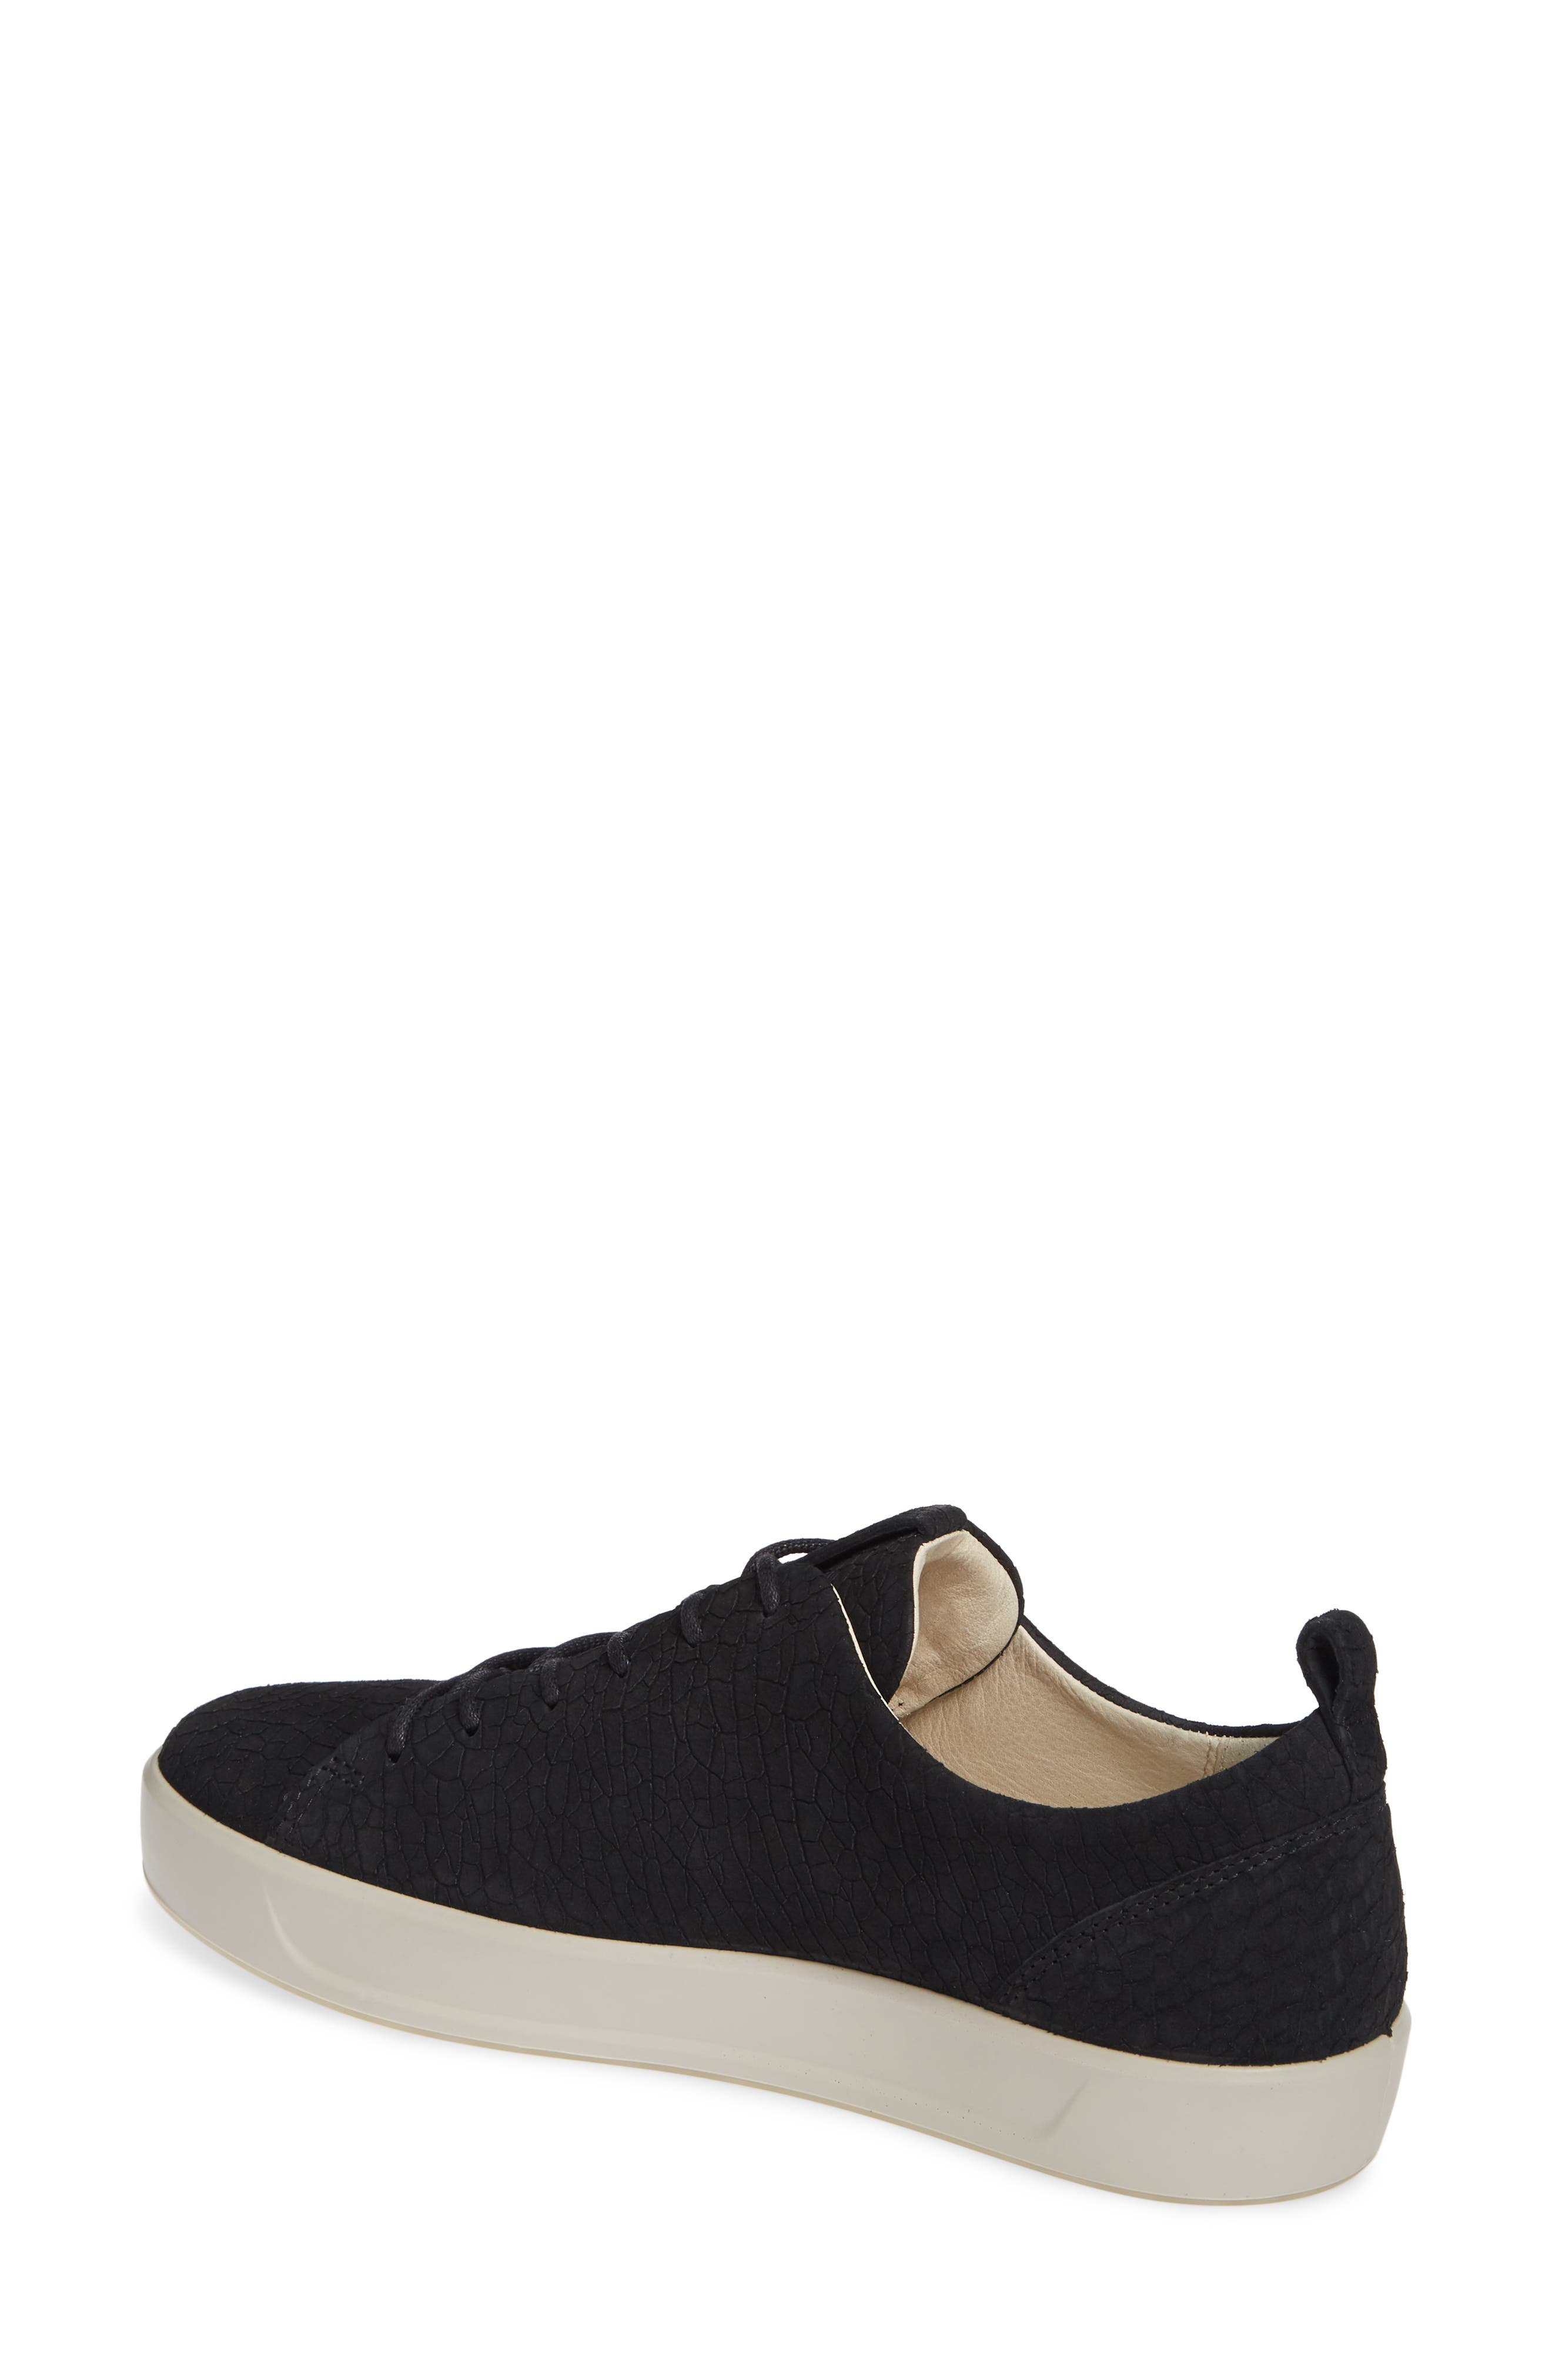 Soft 8 Sneaker,                             Alternate thumbnail 2, color,                             BLACK CRACKLED LEATHER